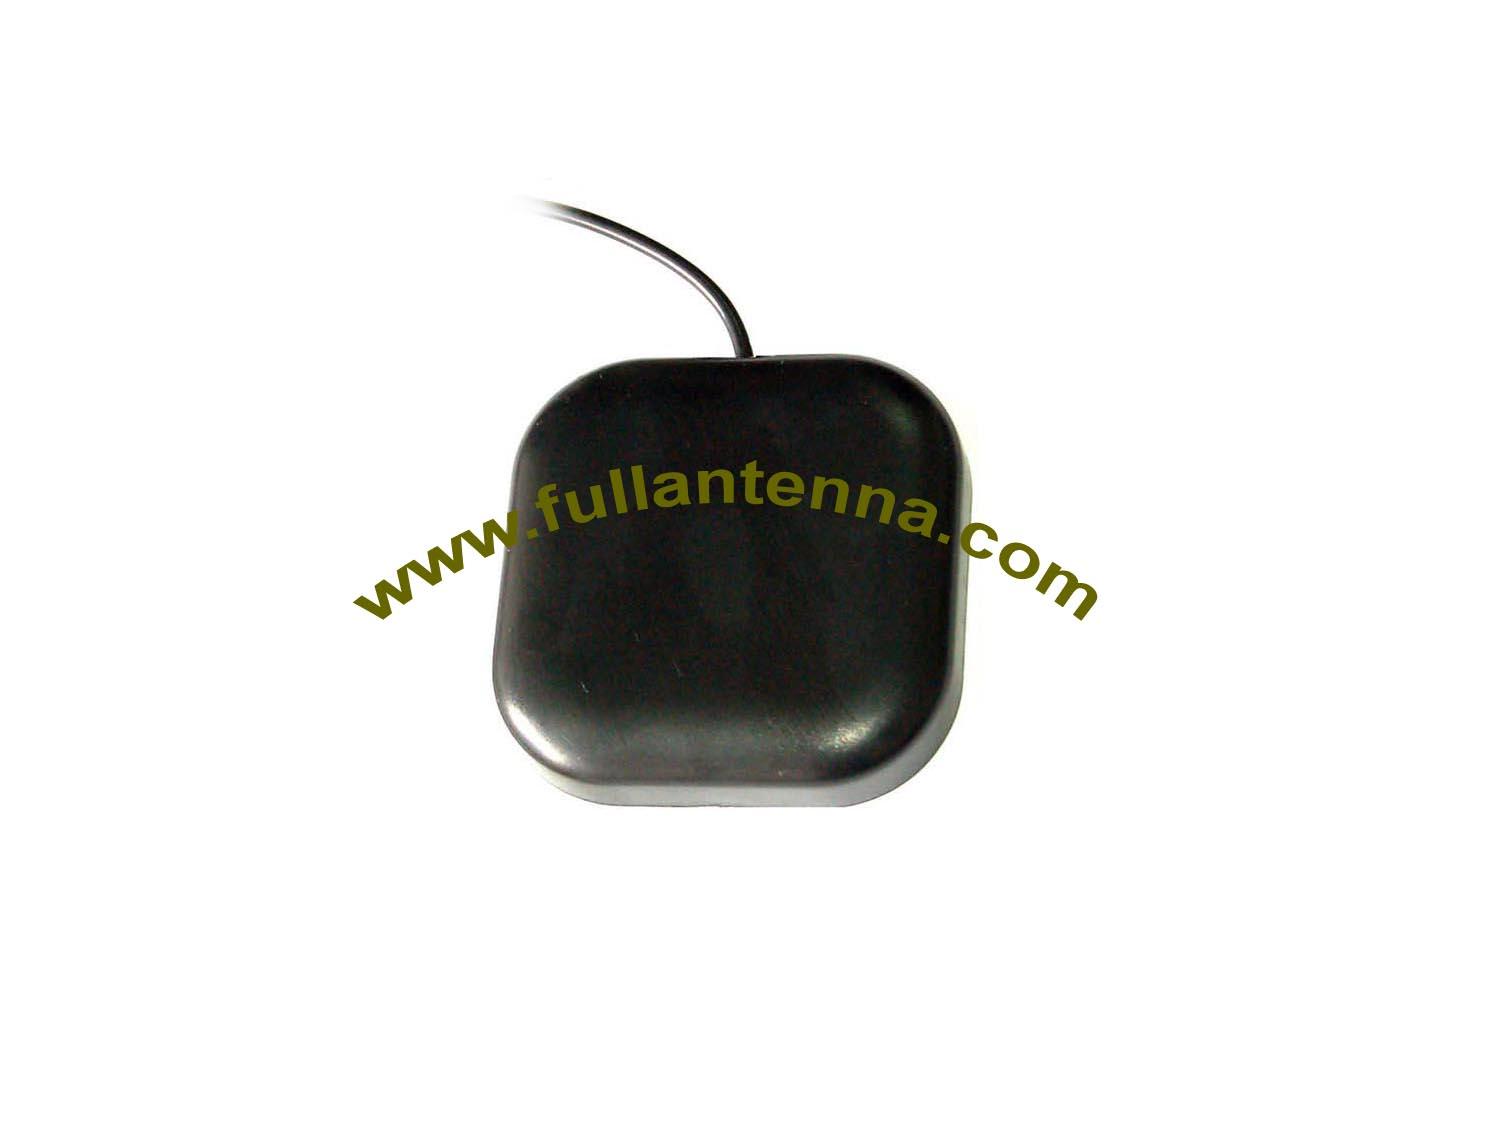 P/N:FAIridium.01,Iridium Antenna,High gain strong signal,magnetic adhesive or screw mount